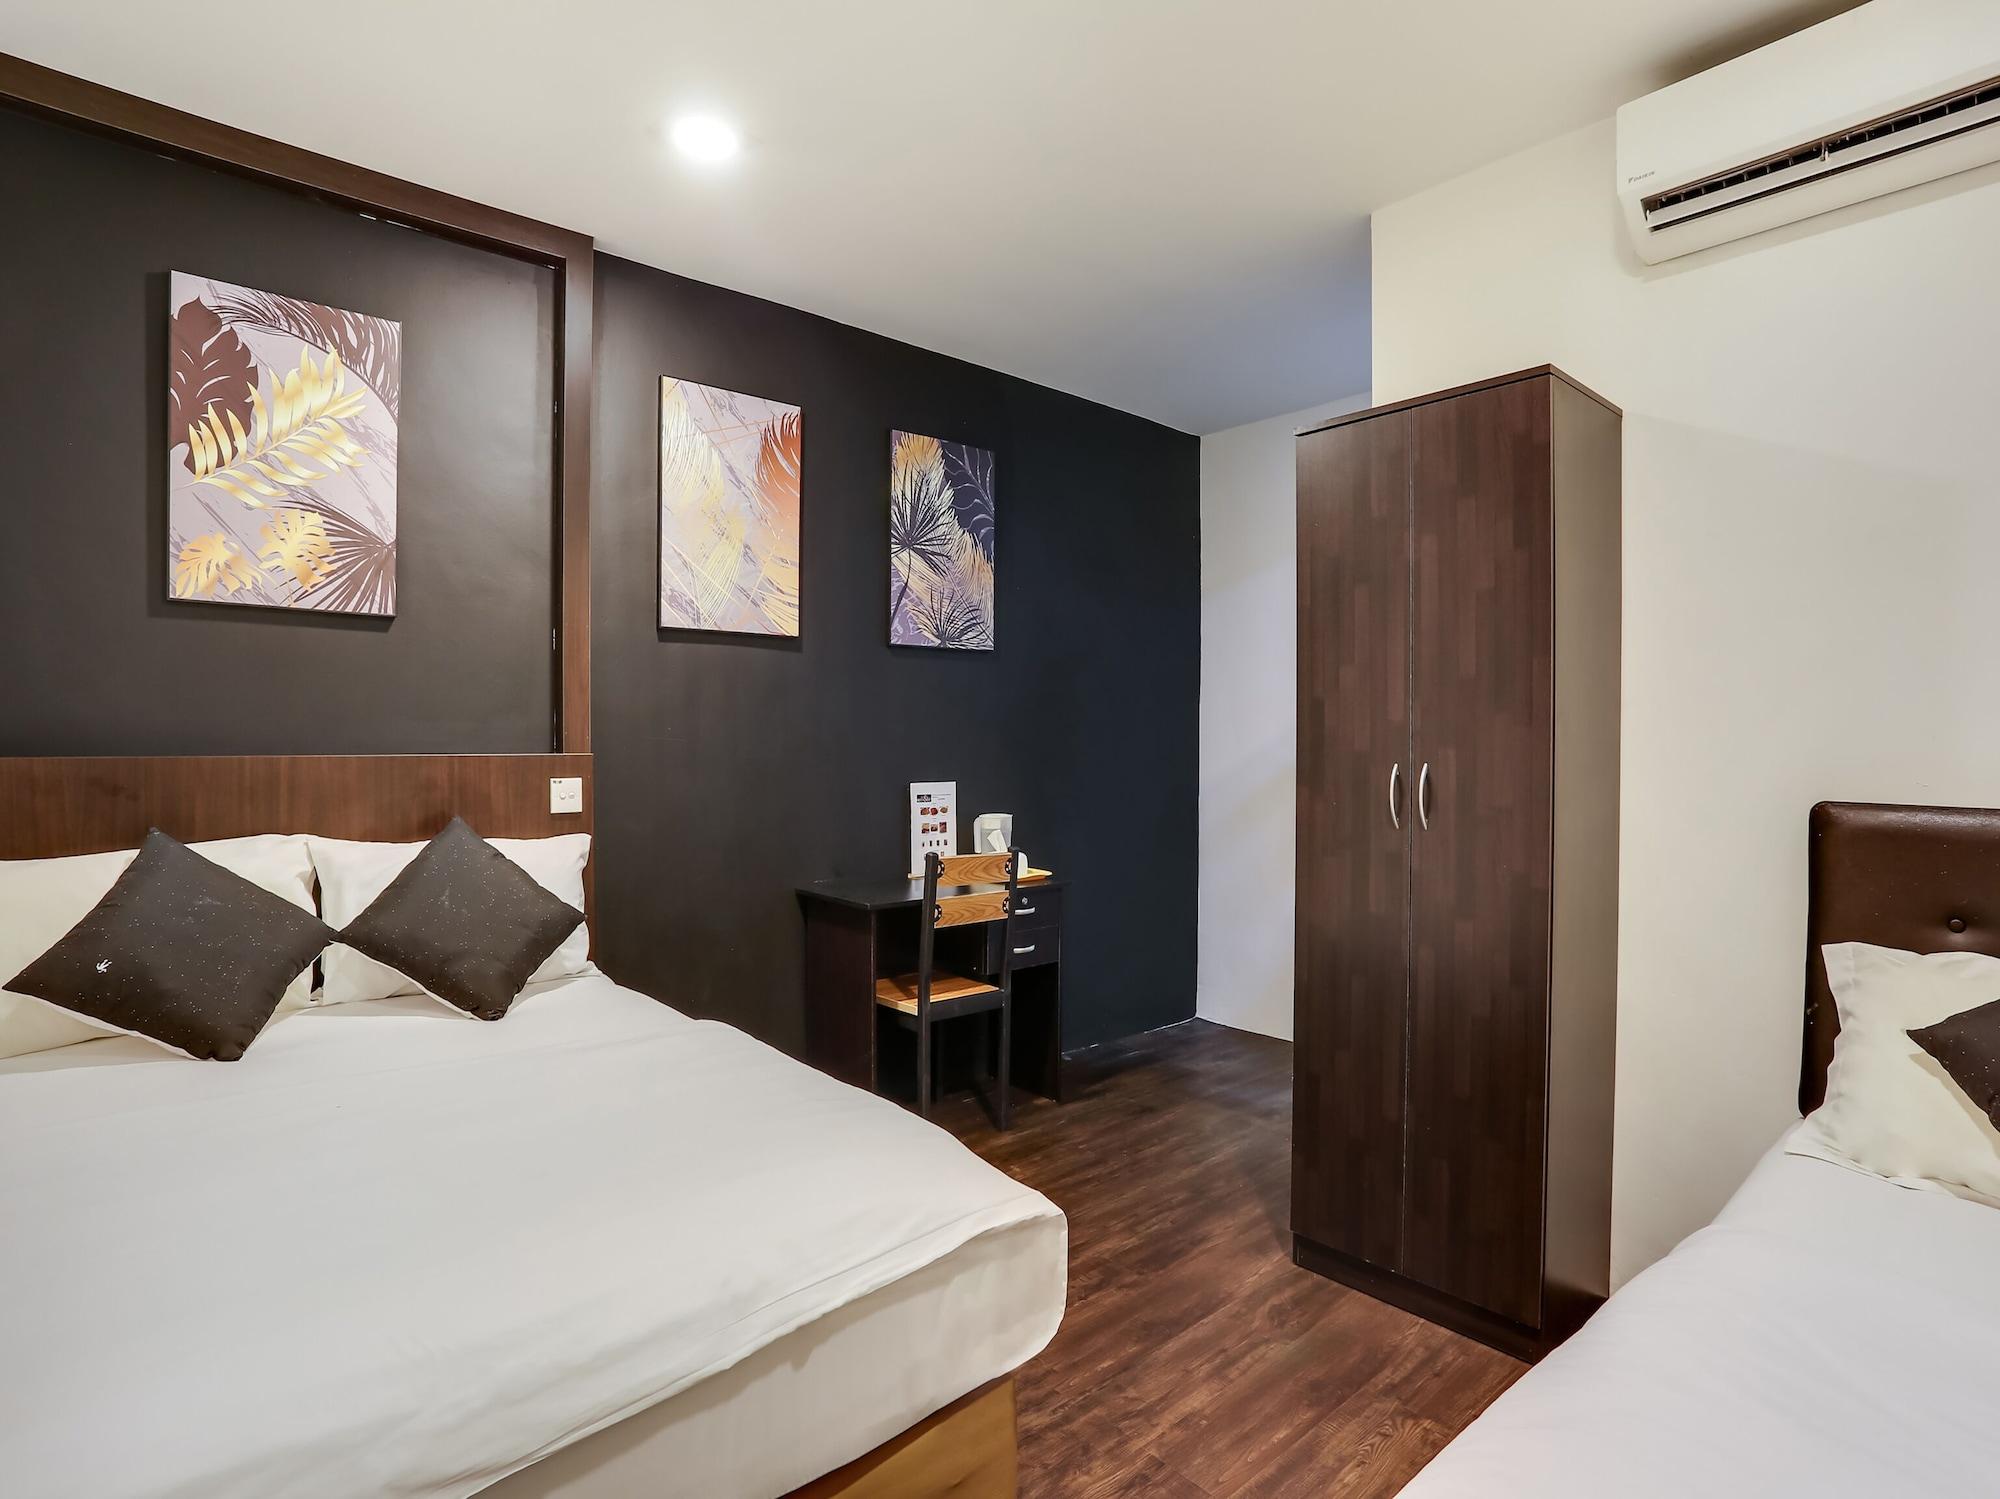 OYO 89430 Rest & Go I-city Hotel, Kuala Lumpur